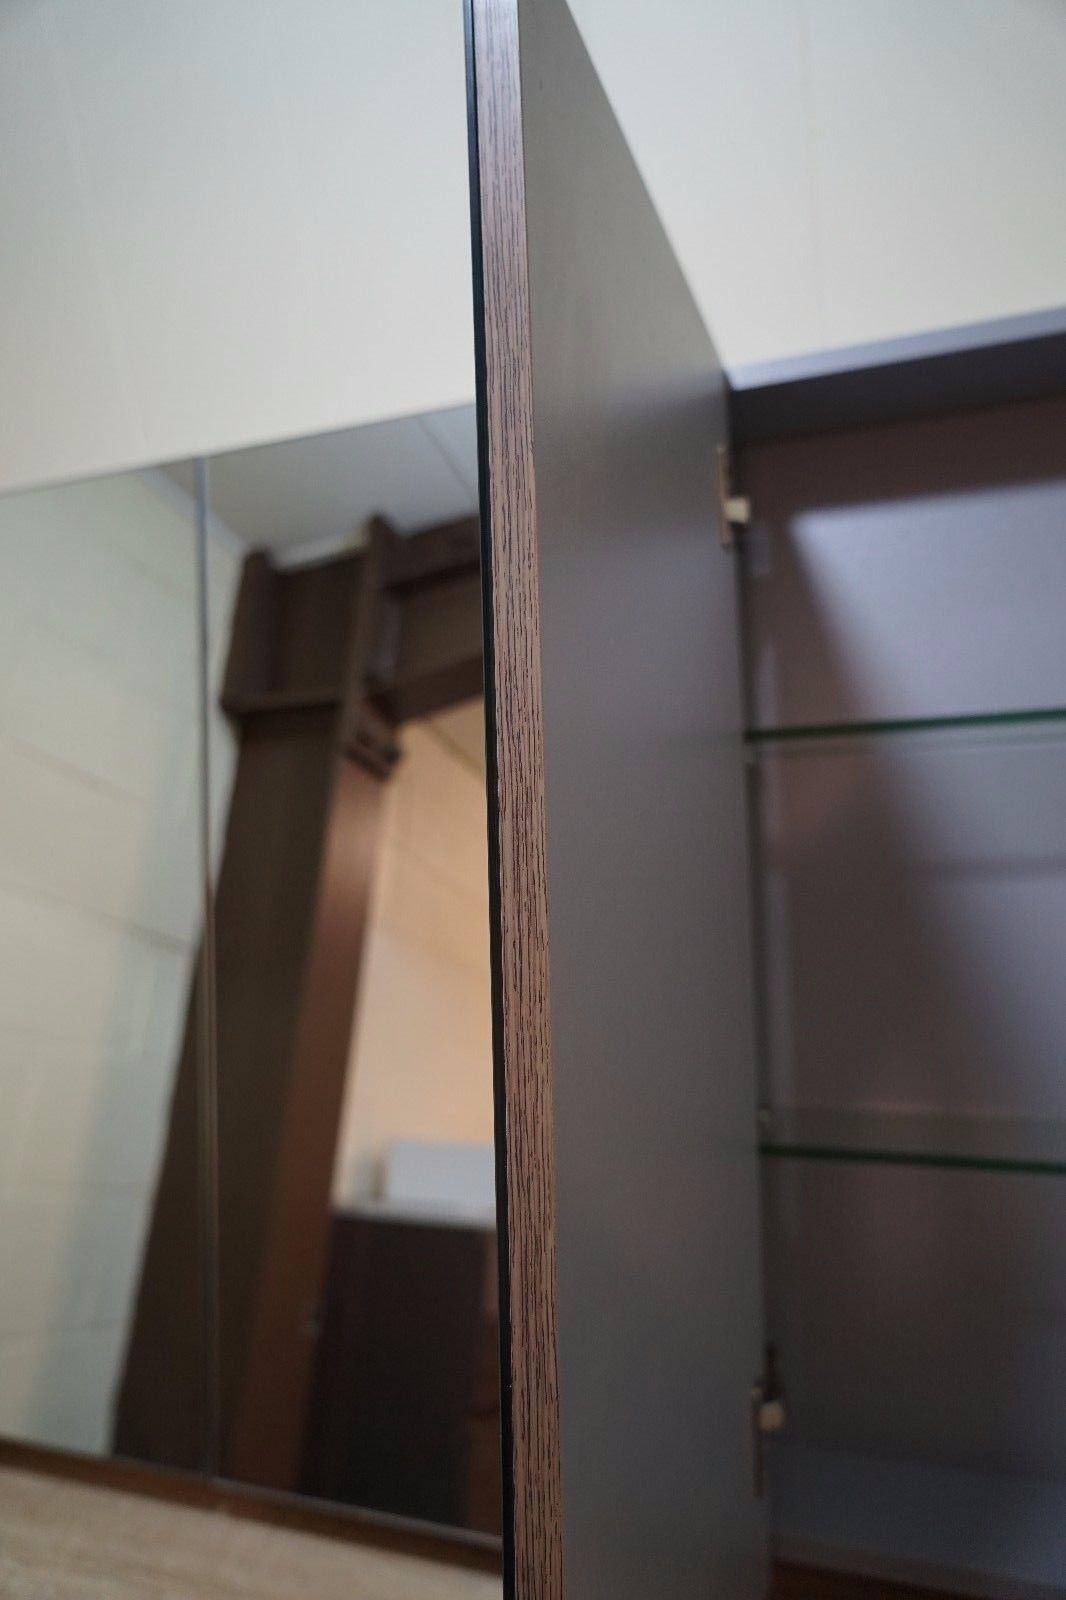 Shave Walnut Pvc Thermal Foil Timber Wood Grain Mirror